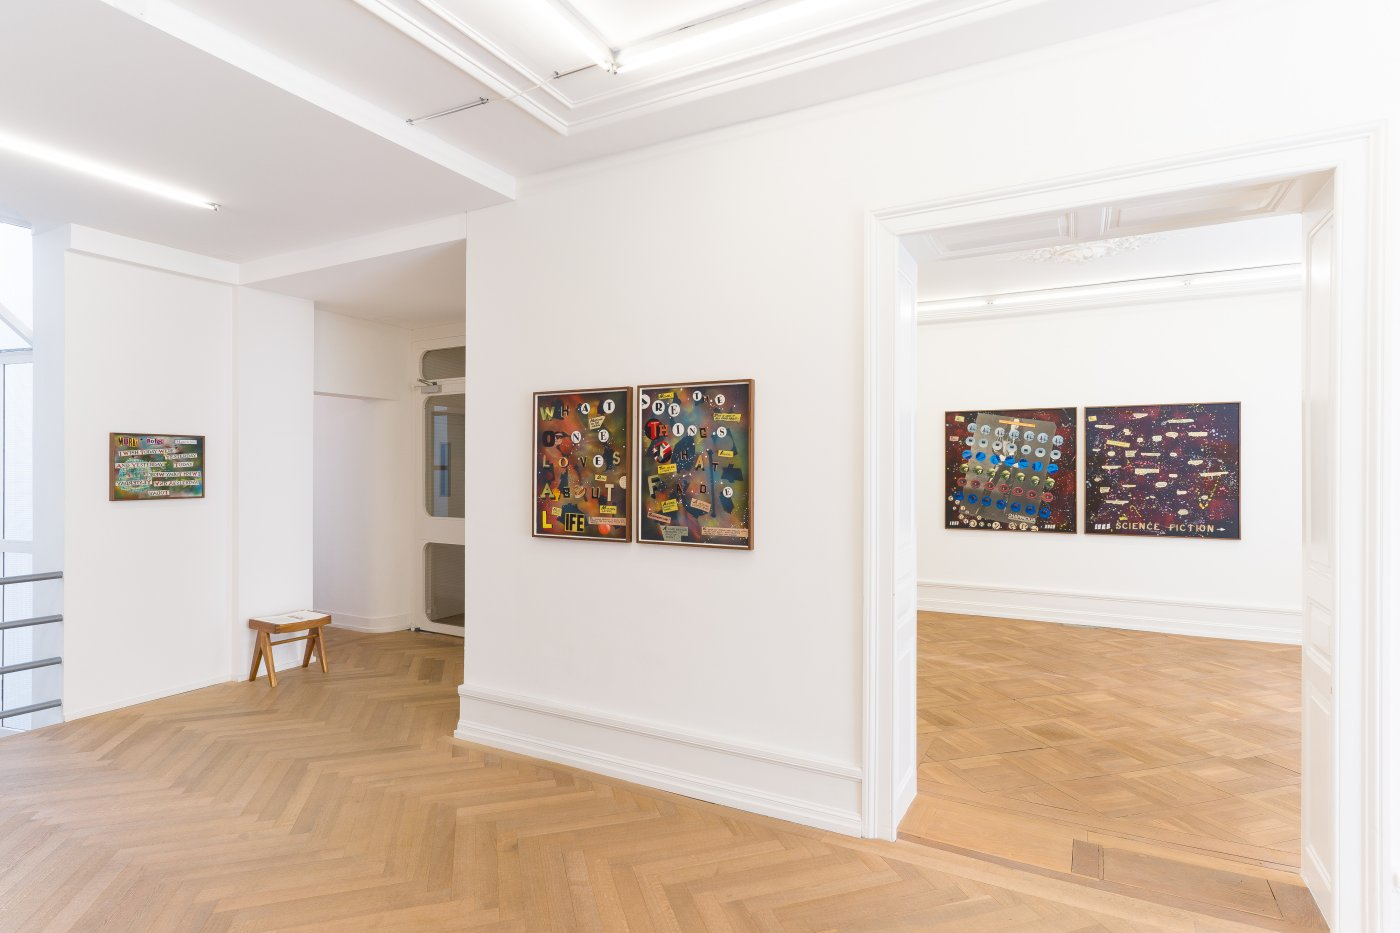 Mai 36 Galerie Allen Ruppersberg 2